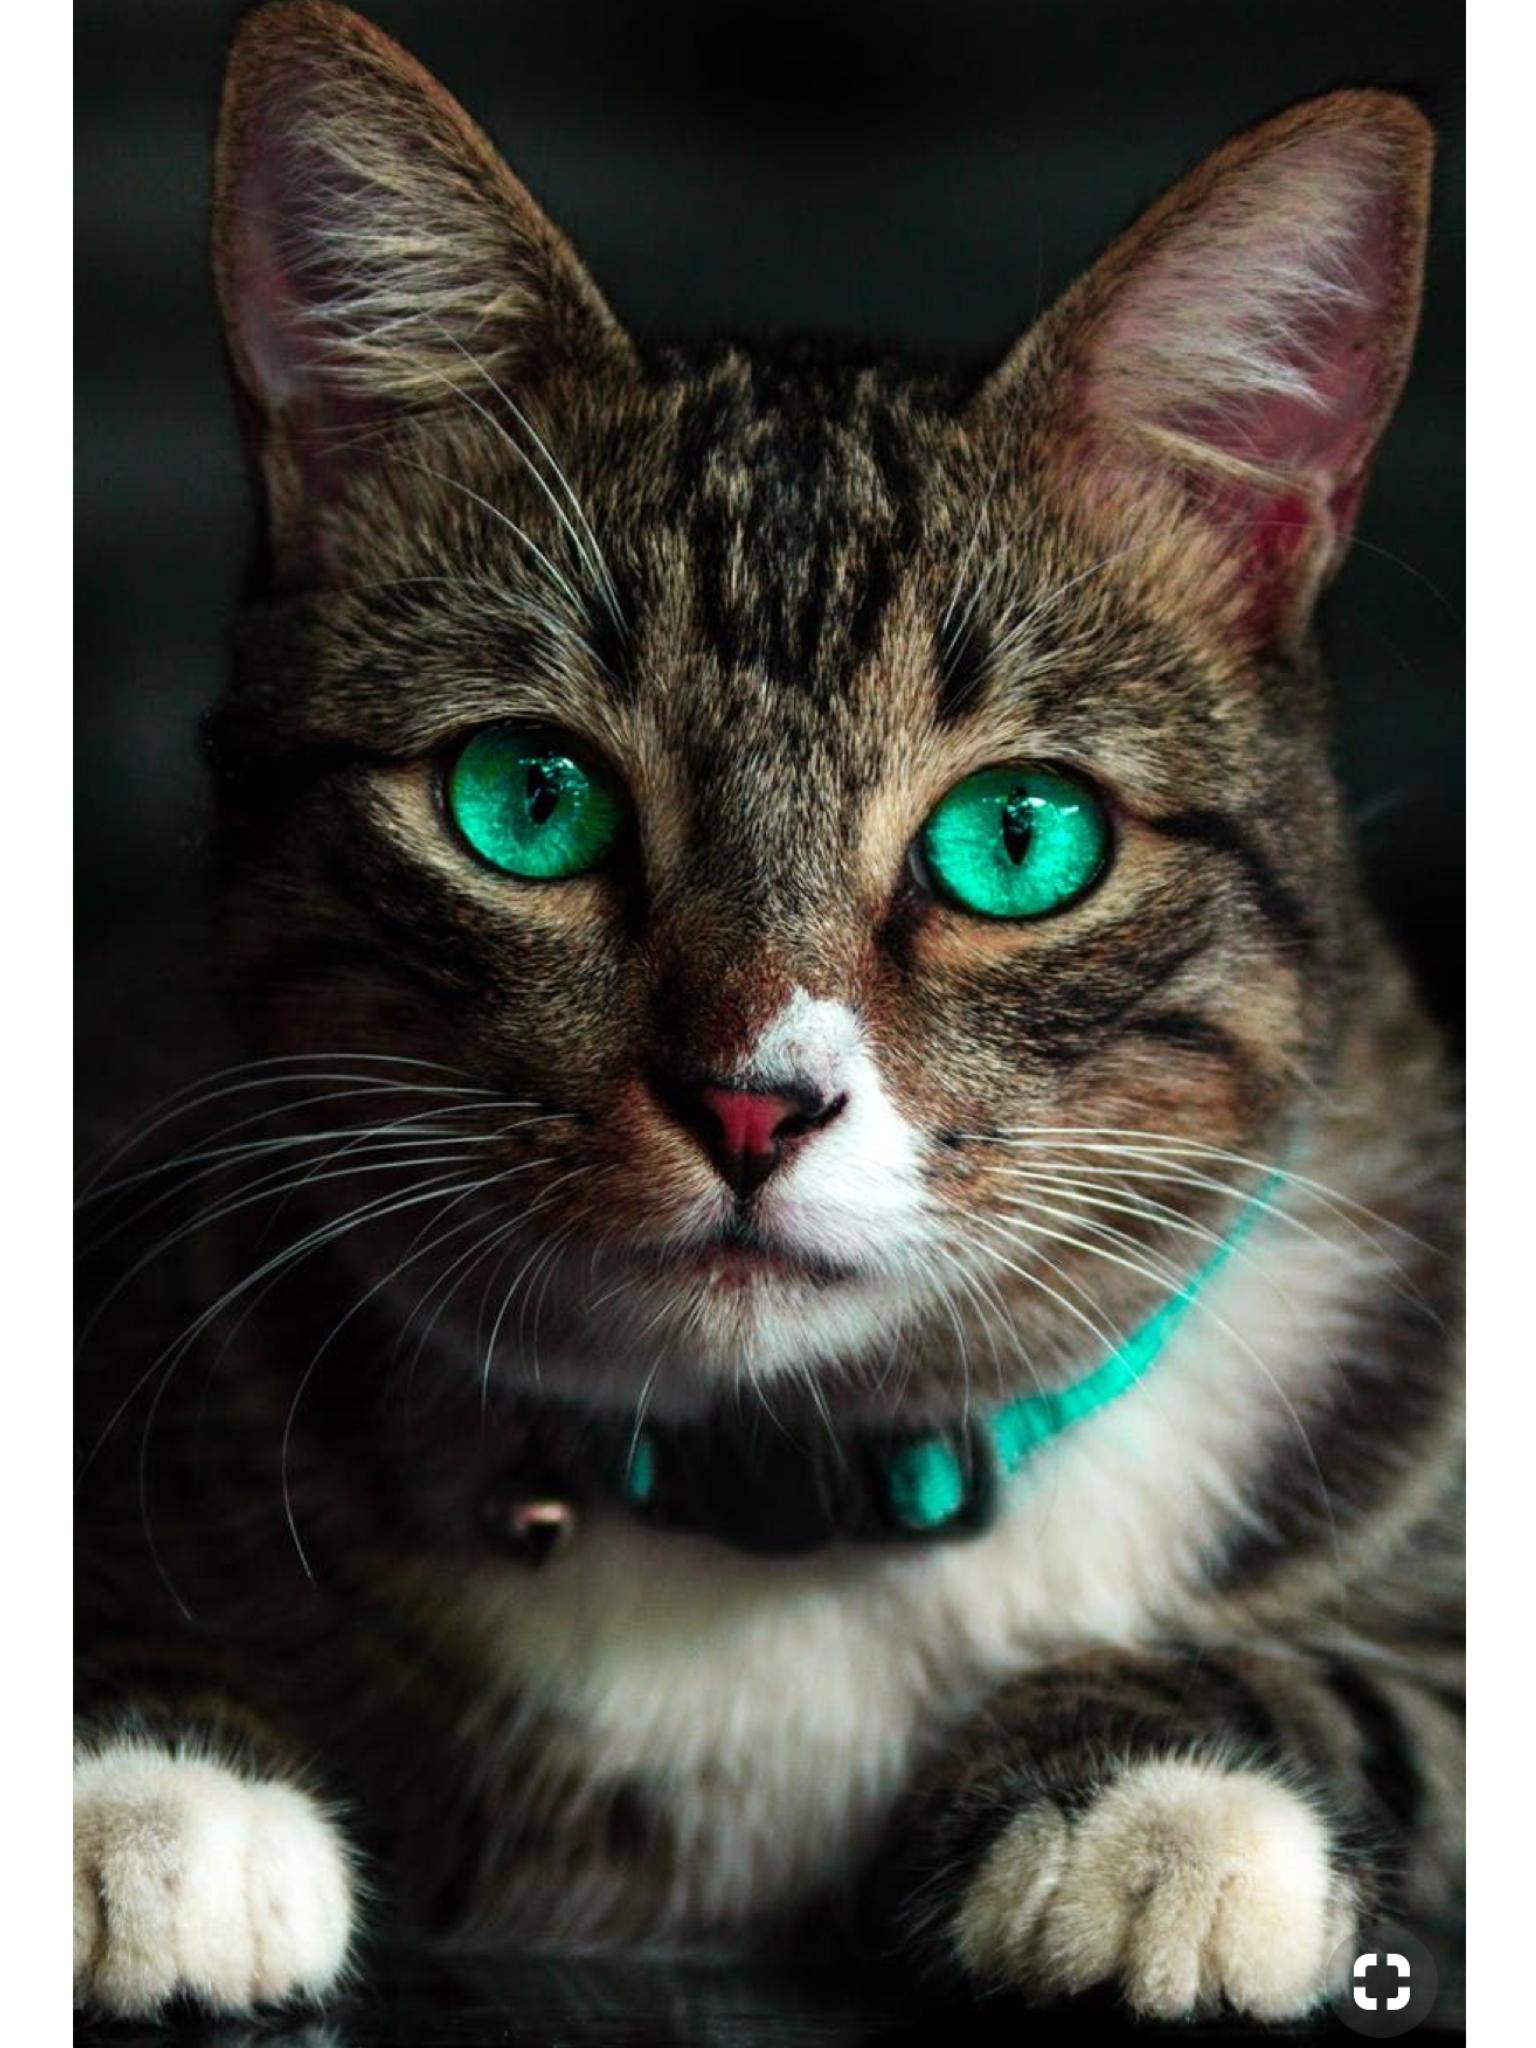 Pin By Erma Delgado On Adorable Cute Cats Beautiful Cats Cute